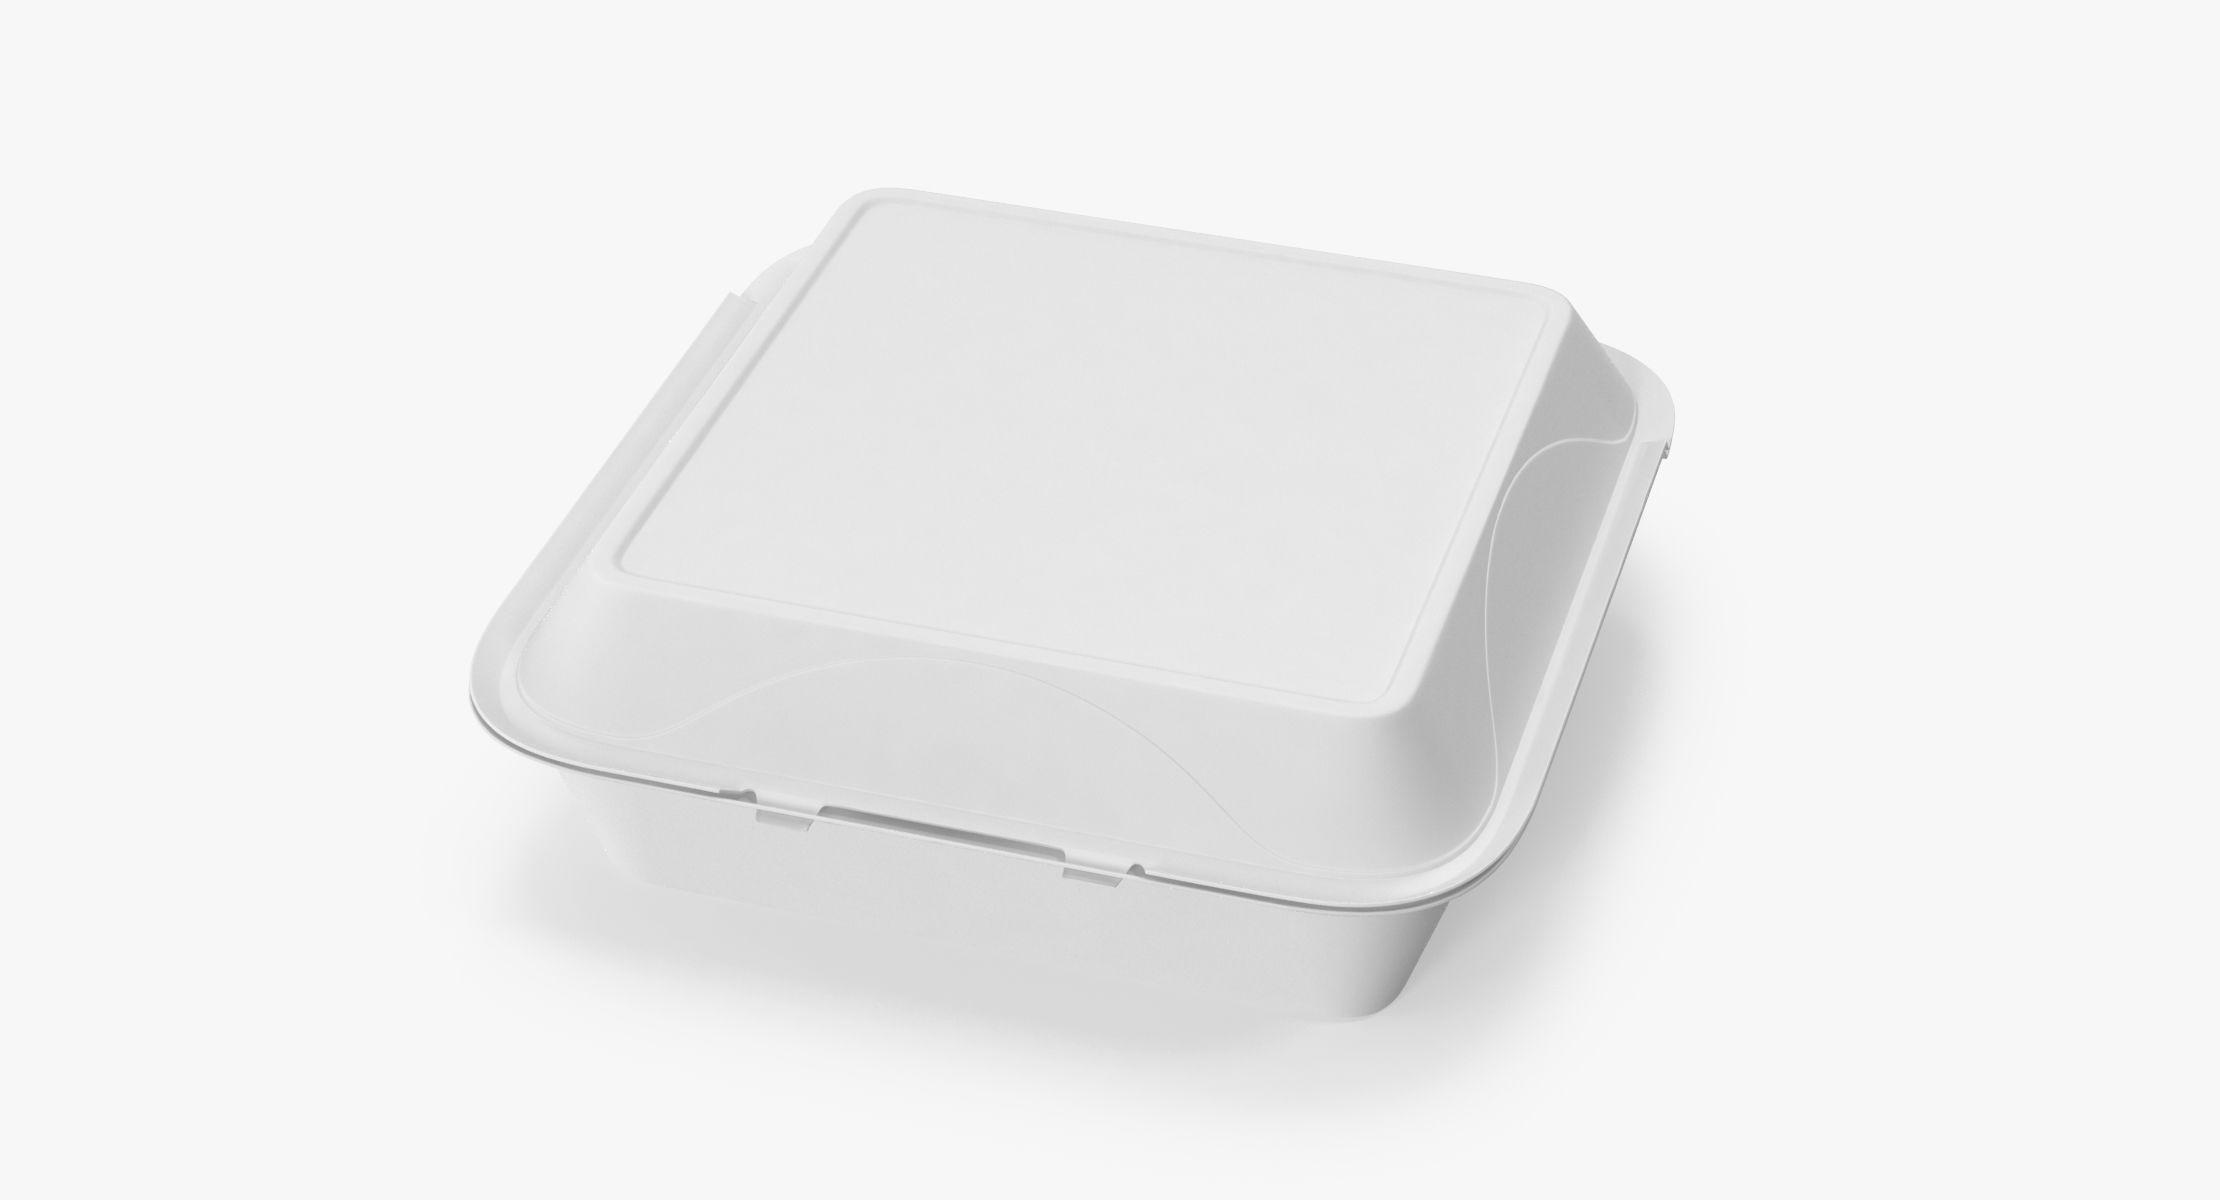 Styrofoam To Go Box Closed - reel 1